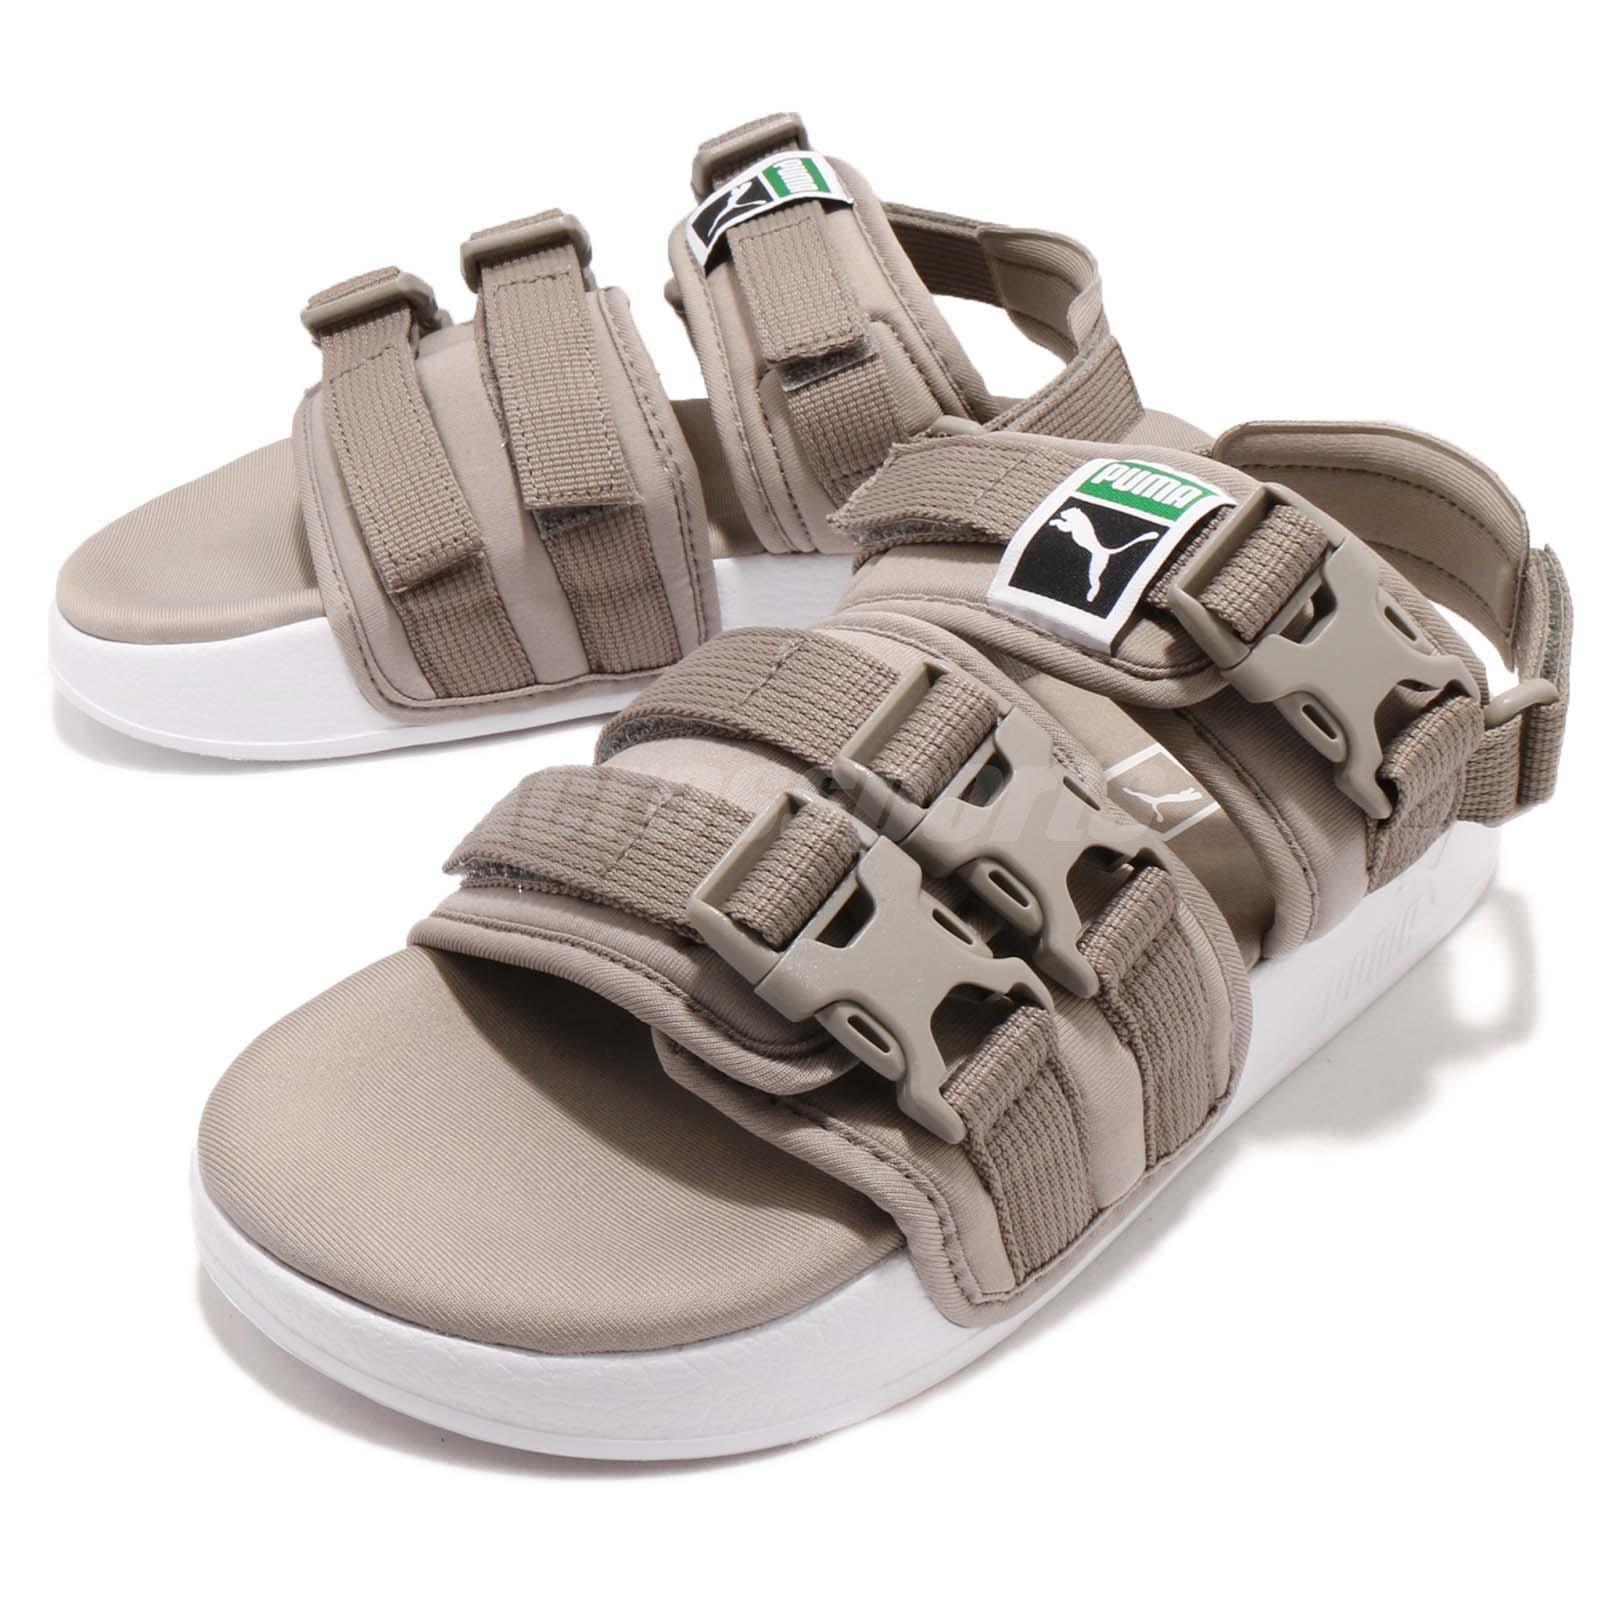 2462a12c762 Puma Leadcat YLM Grey White One Click Men Lifestyle Sandal Shoes ...